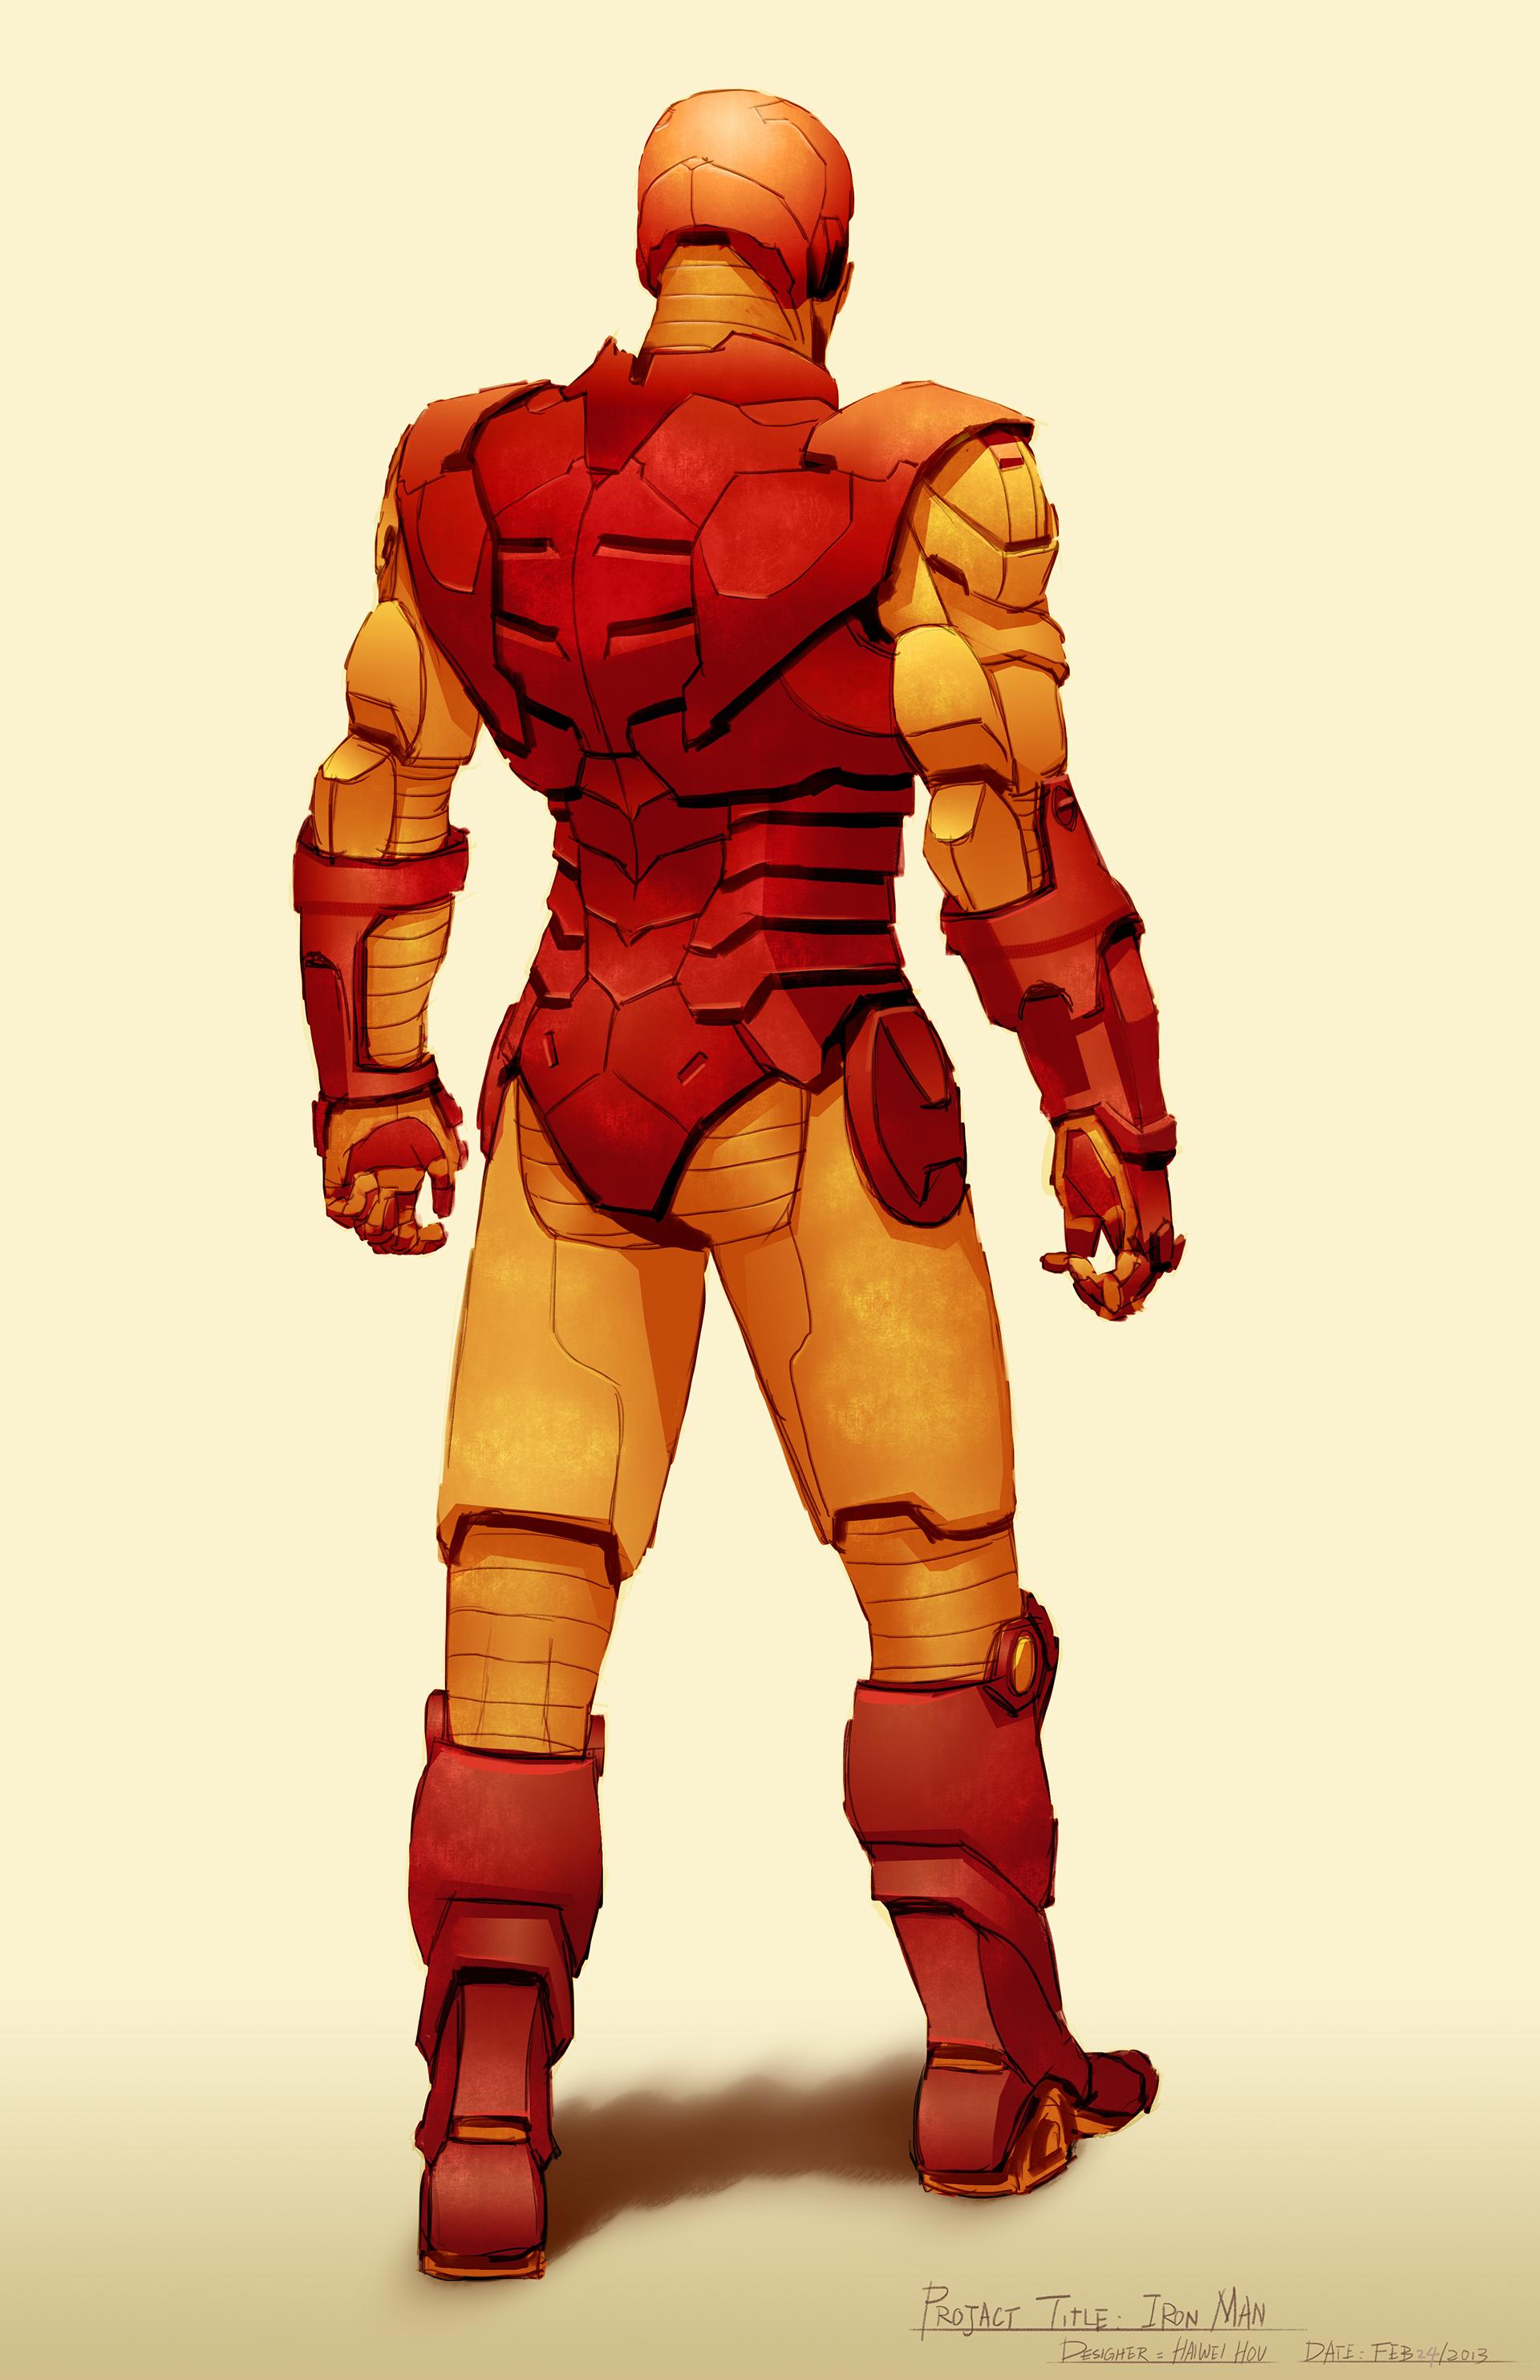 Iron Man Design - Back